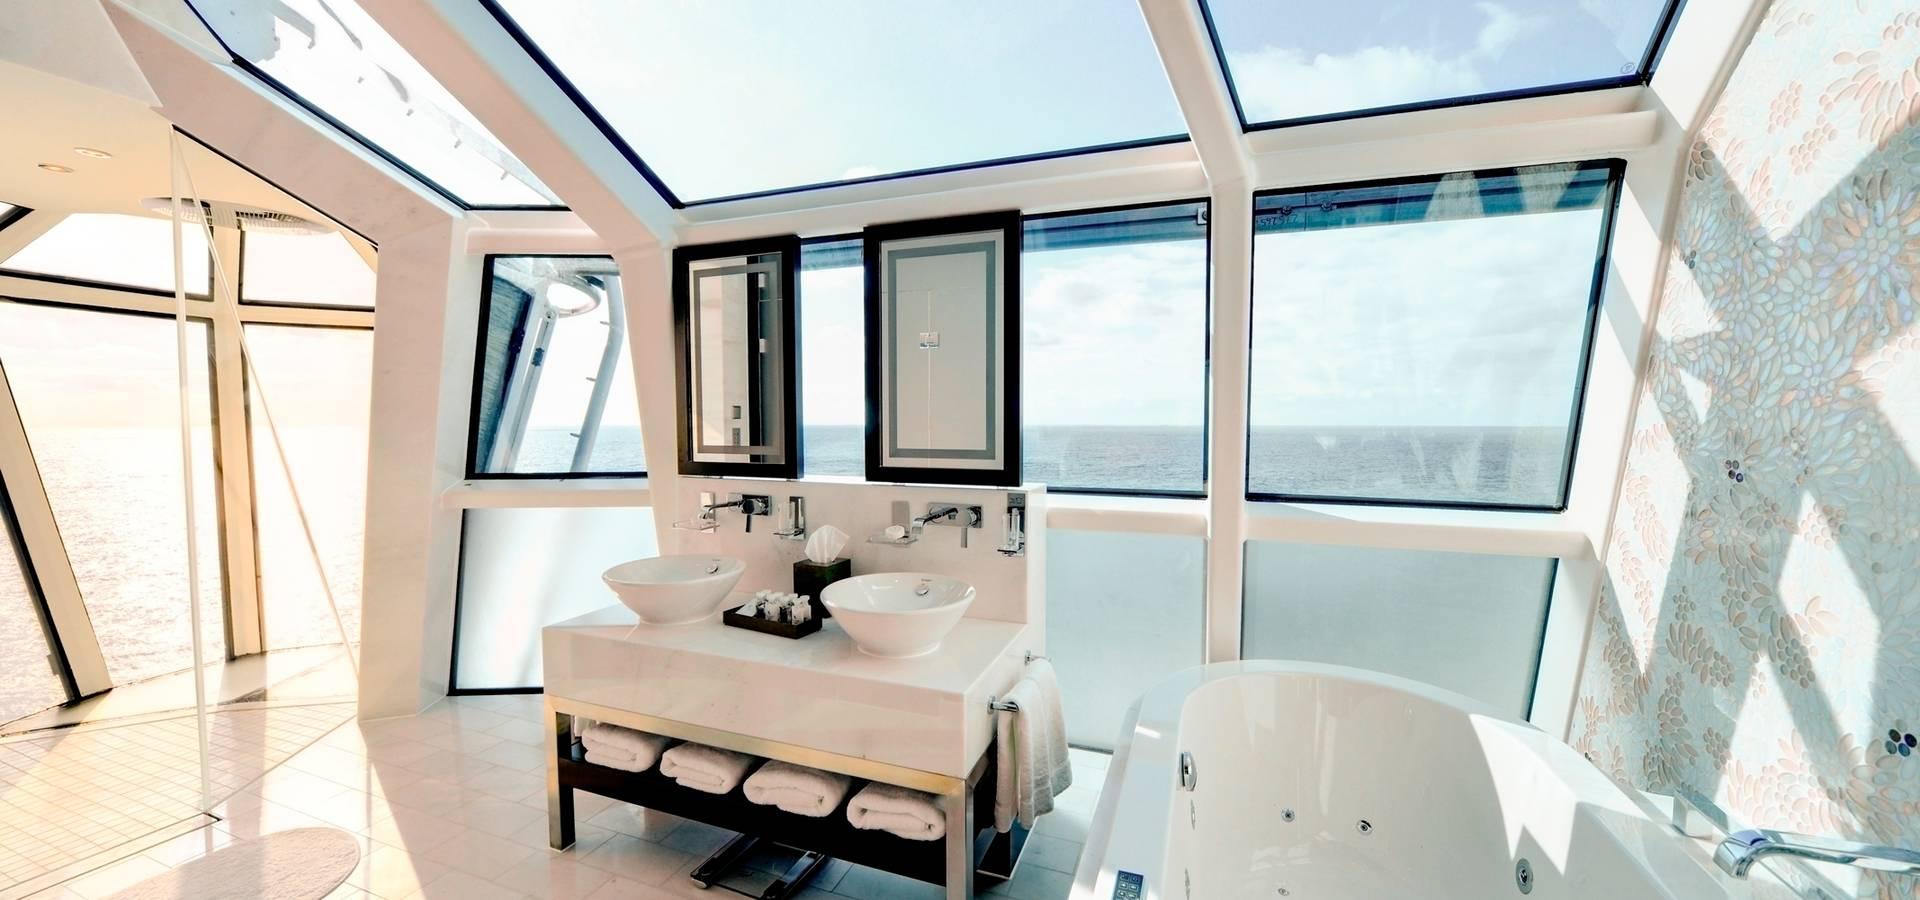 disney dream disney fantasy von aip innenprojekt gmbh homify. Black Bedroom Furniture Sets. Home Design Ideas